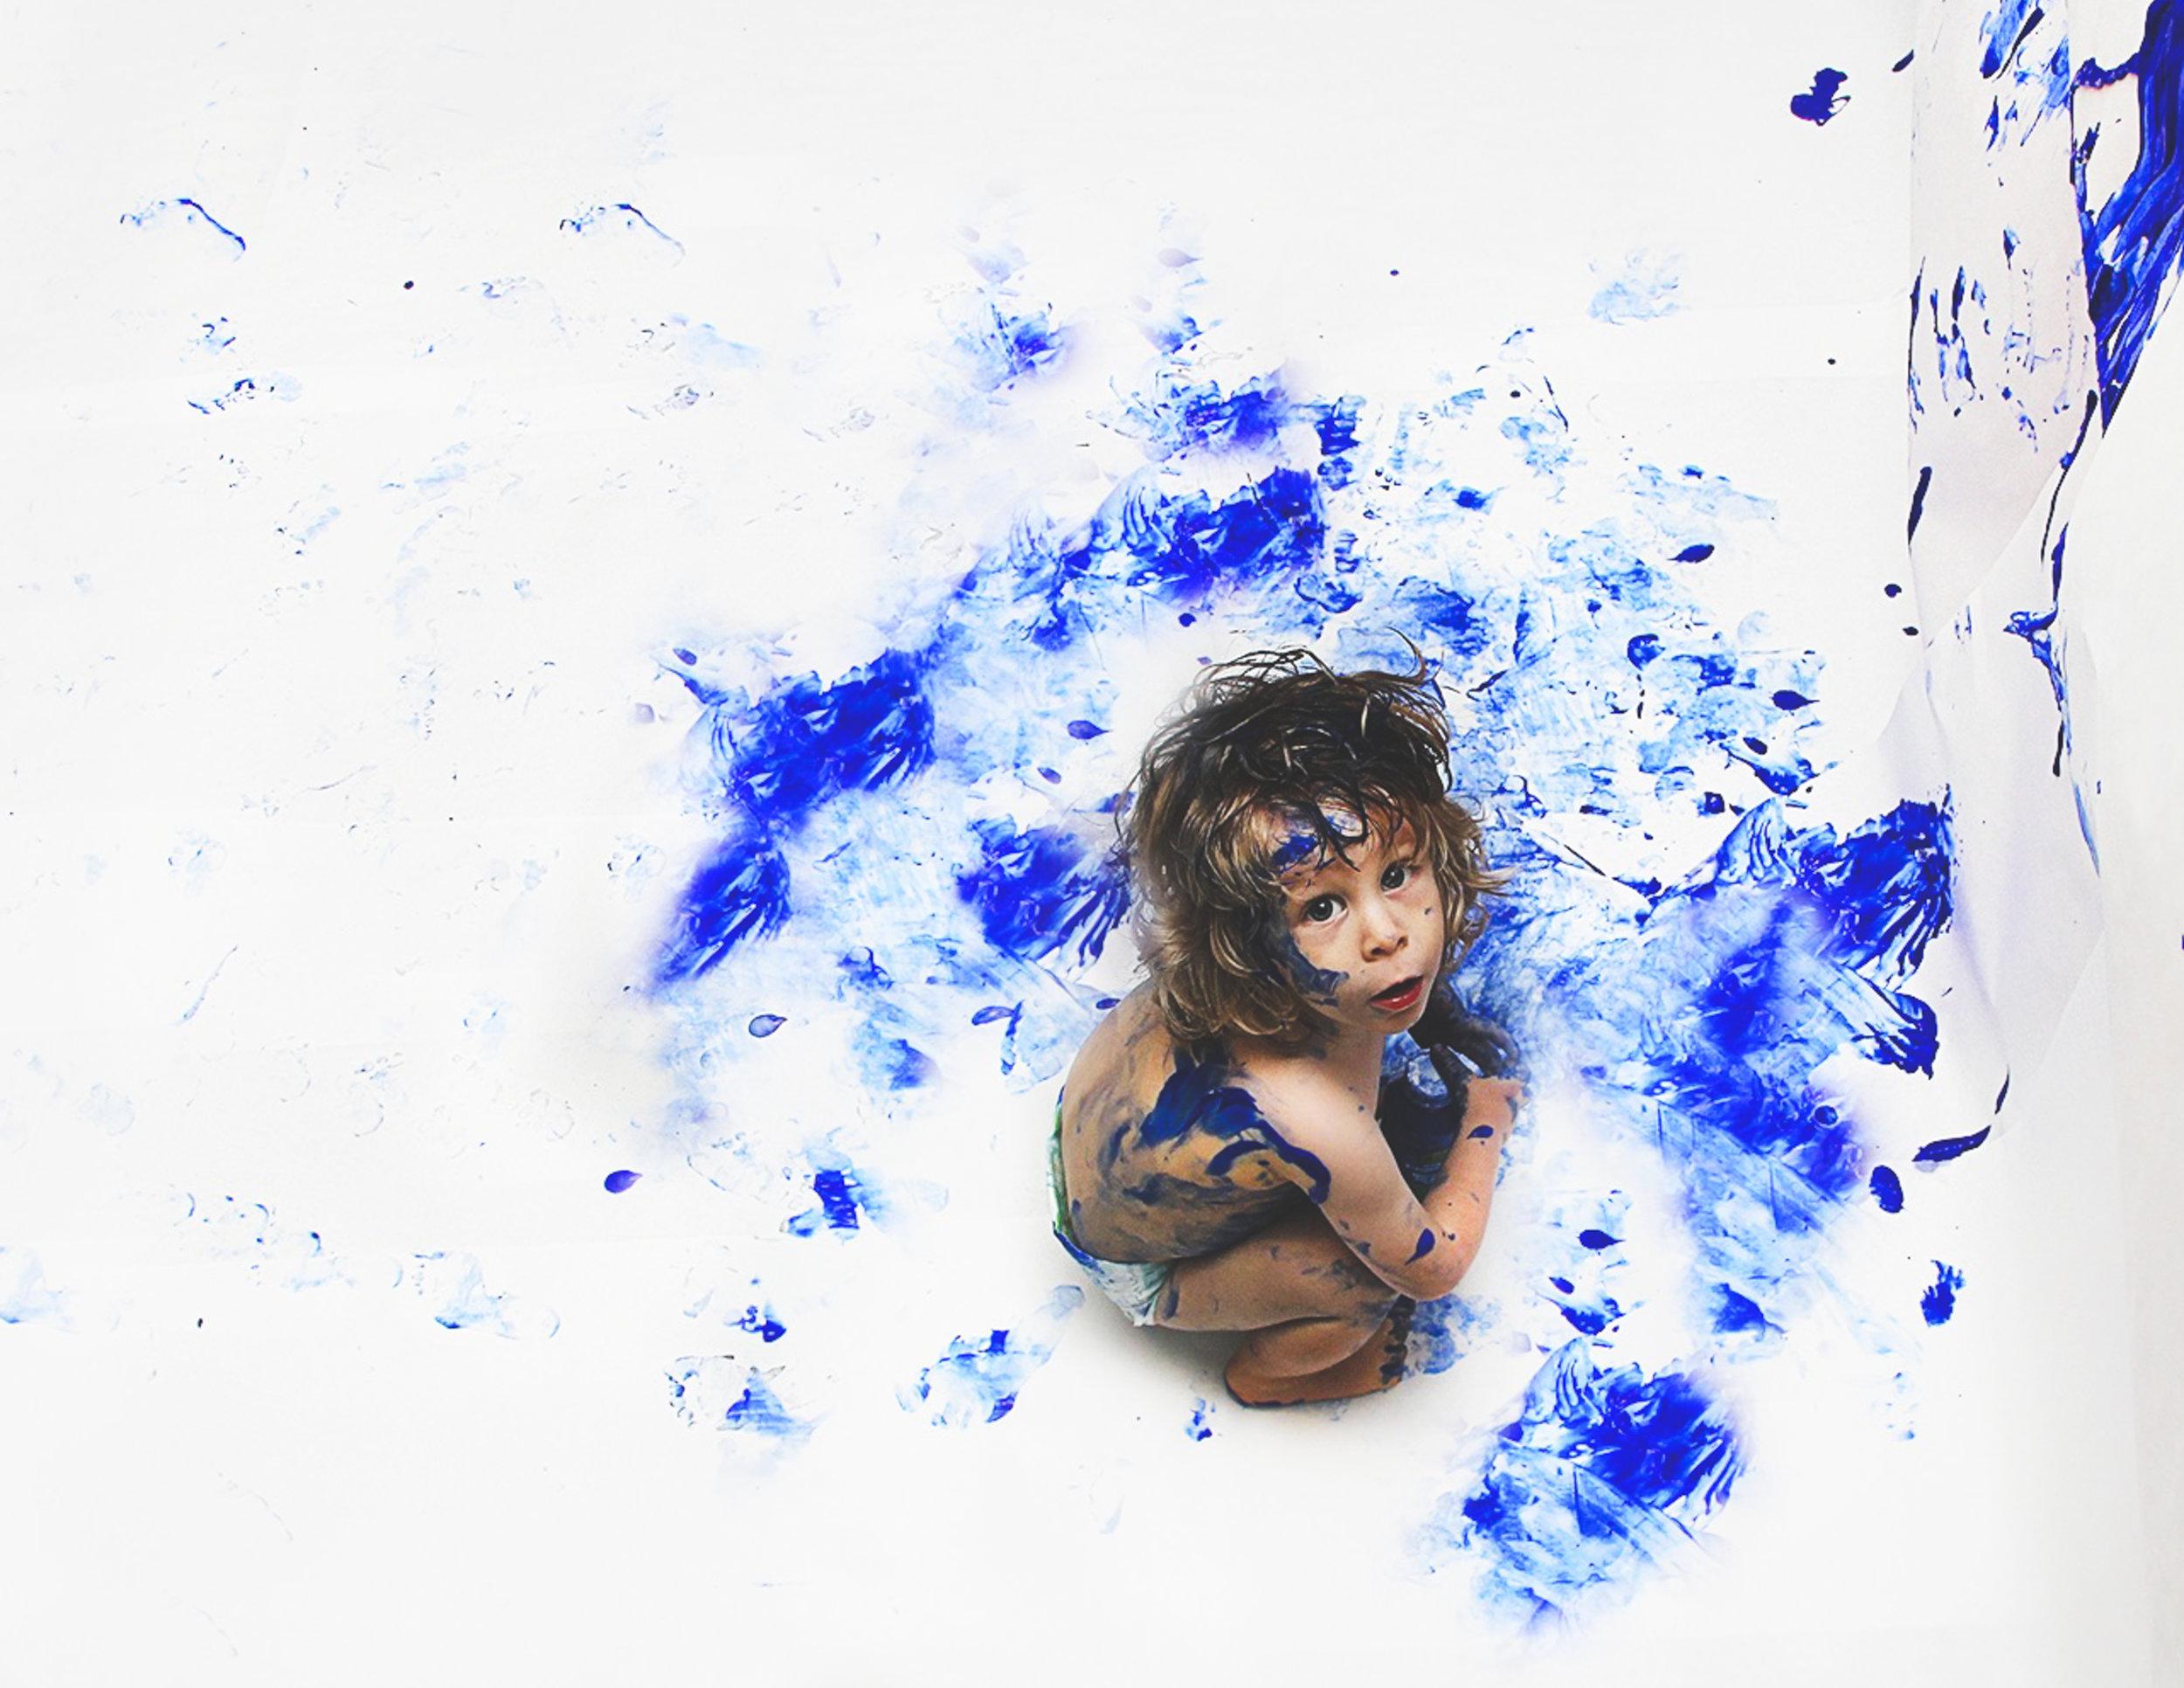 Blue paint and little boy art photo copy.jpg